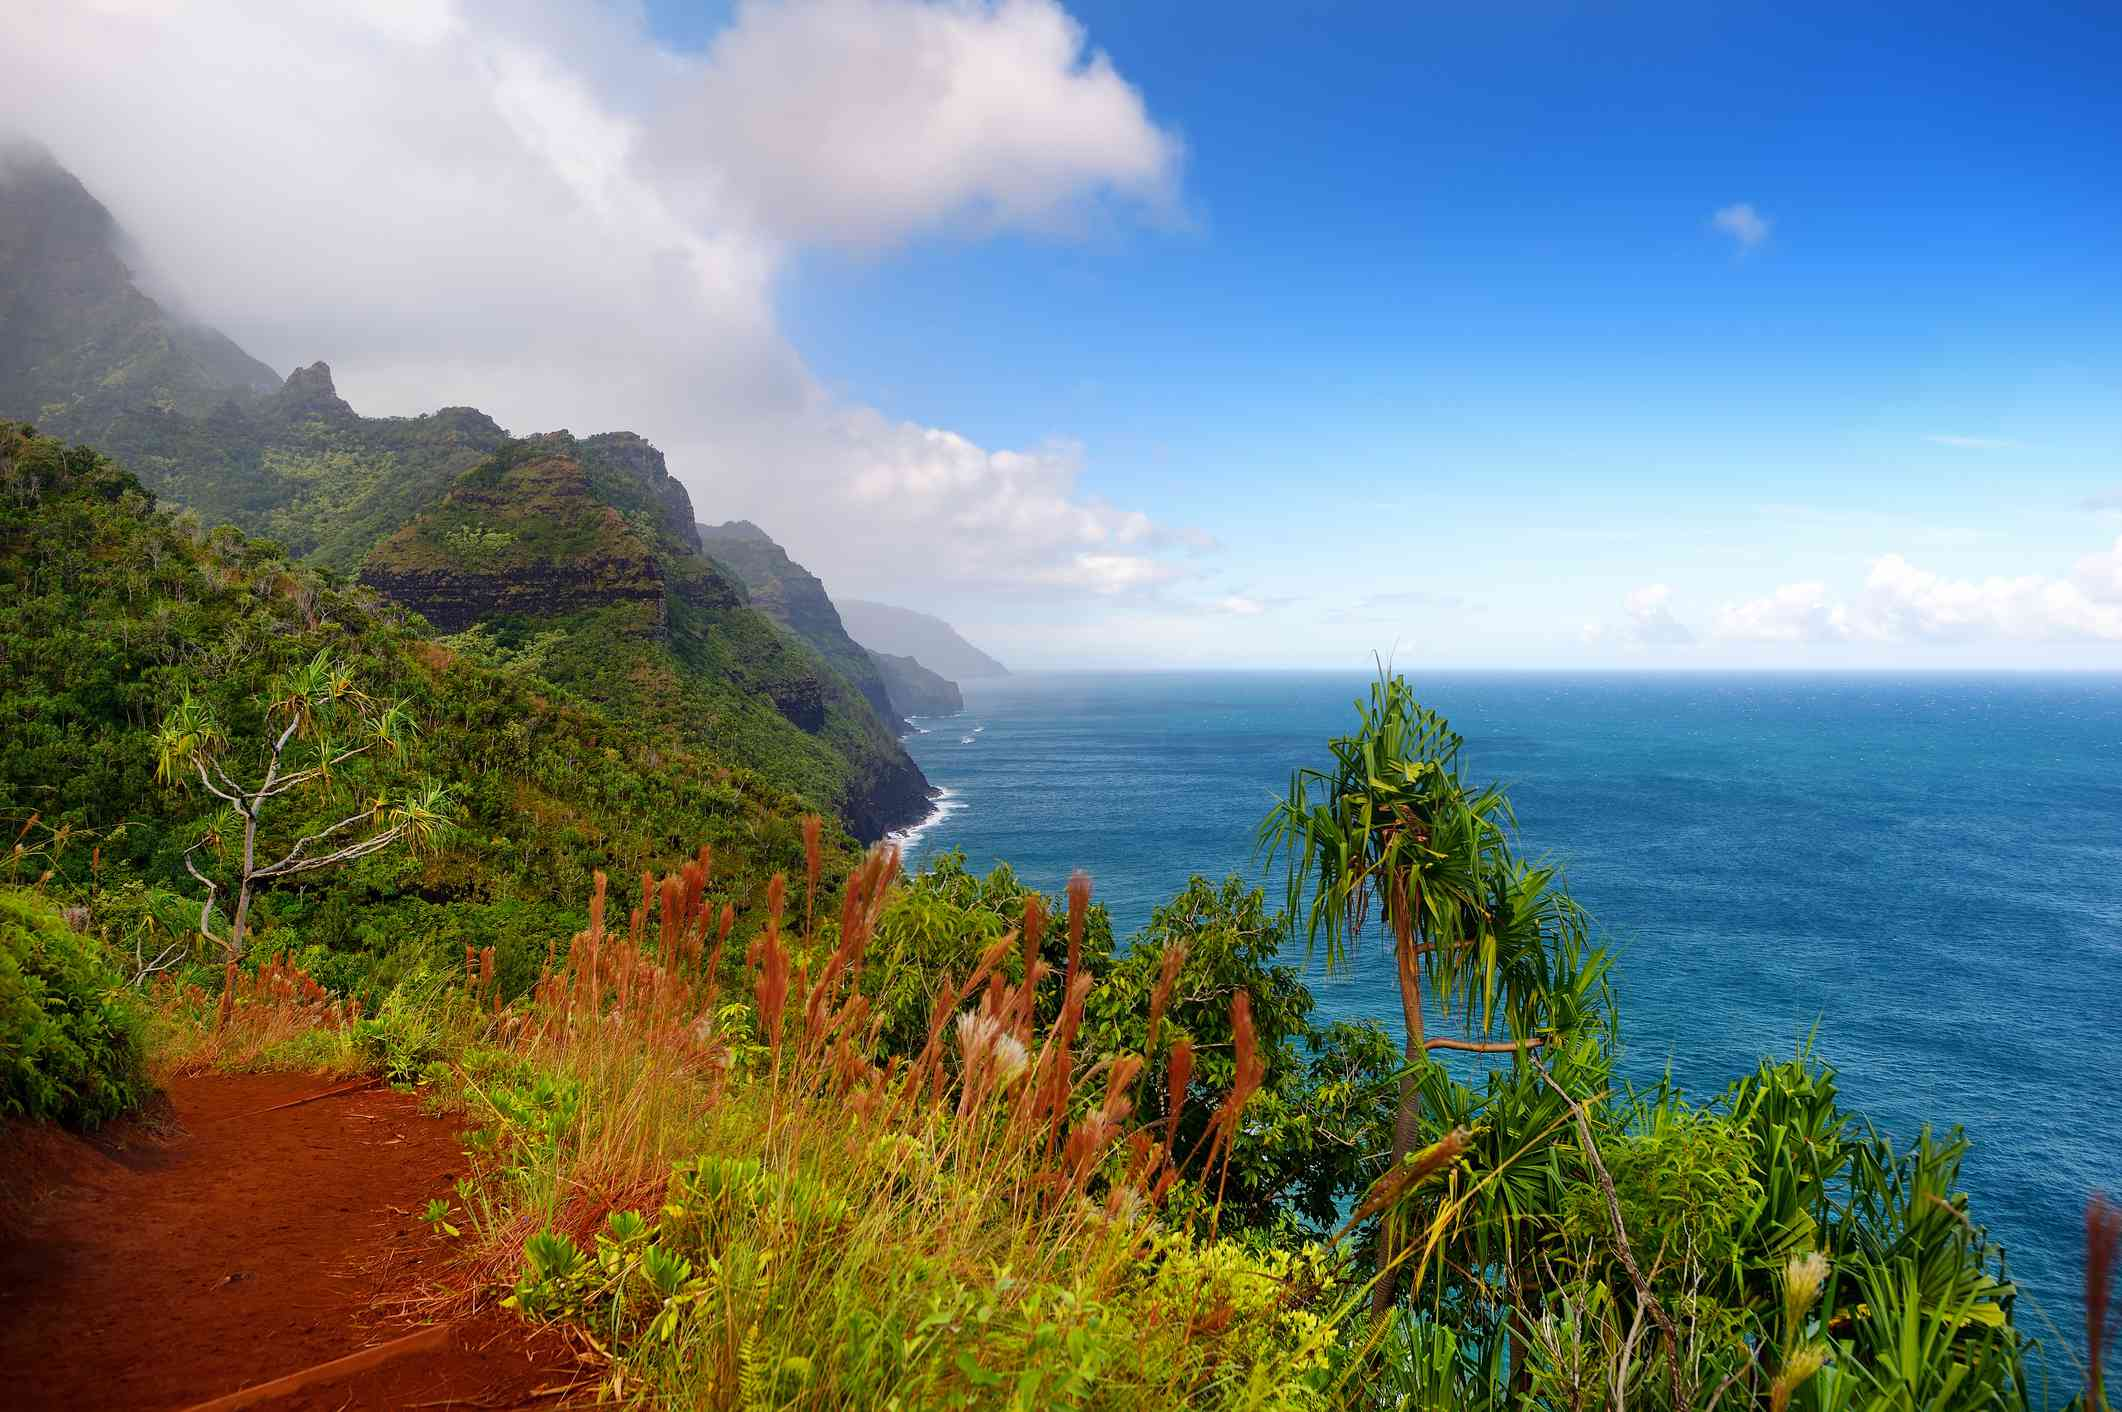 A view from the trail at Kalalau on Kauai, Hawaii